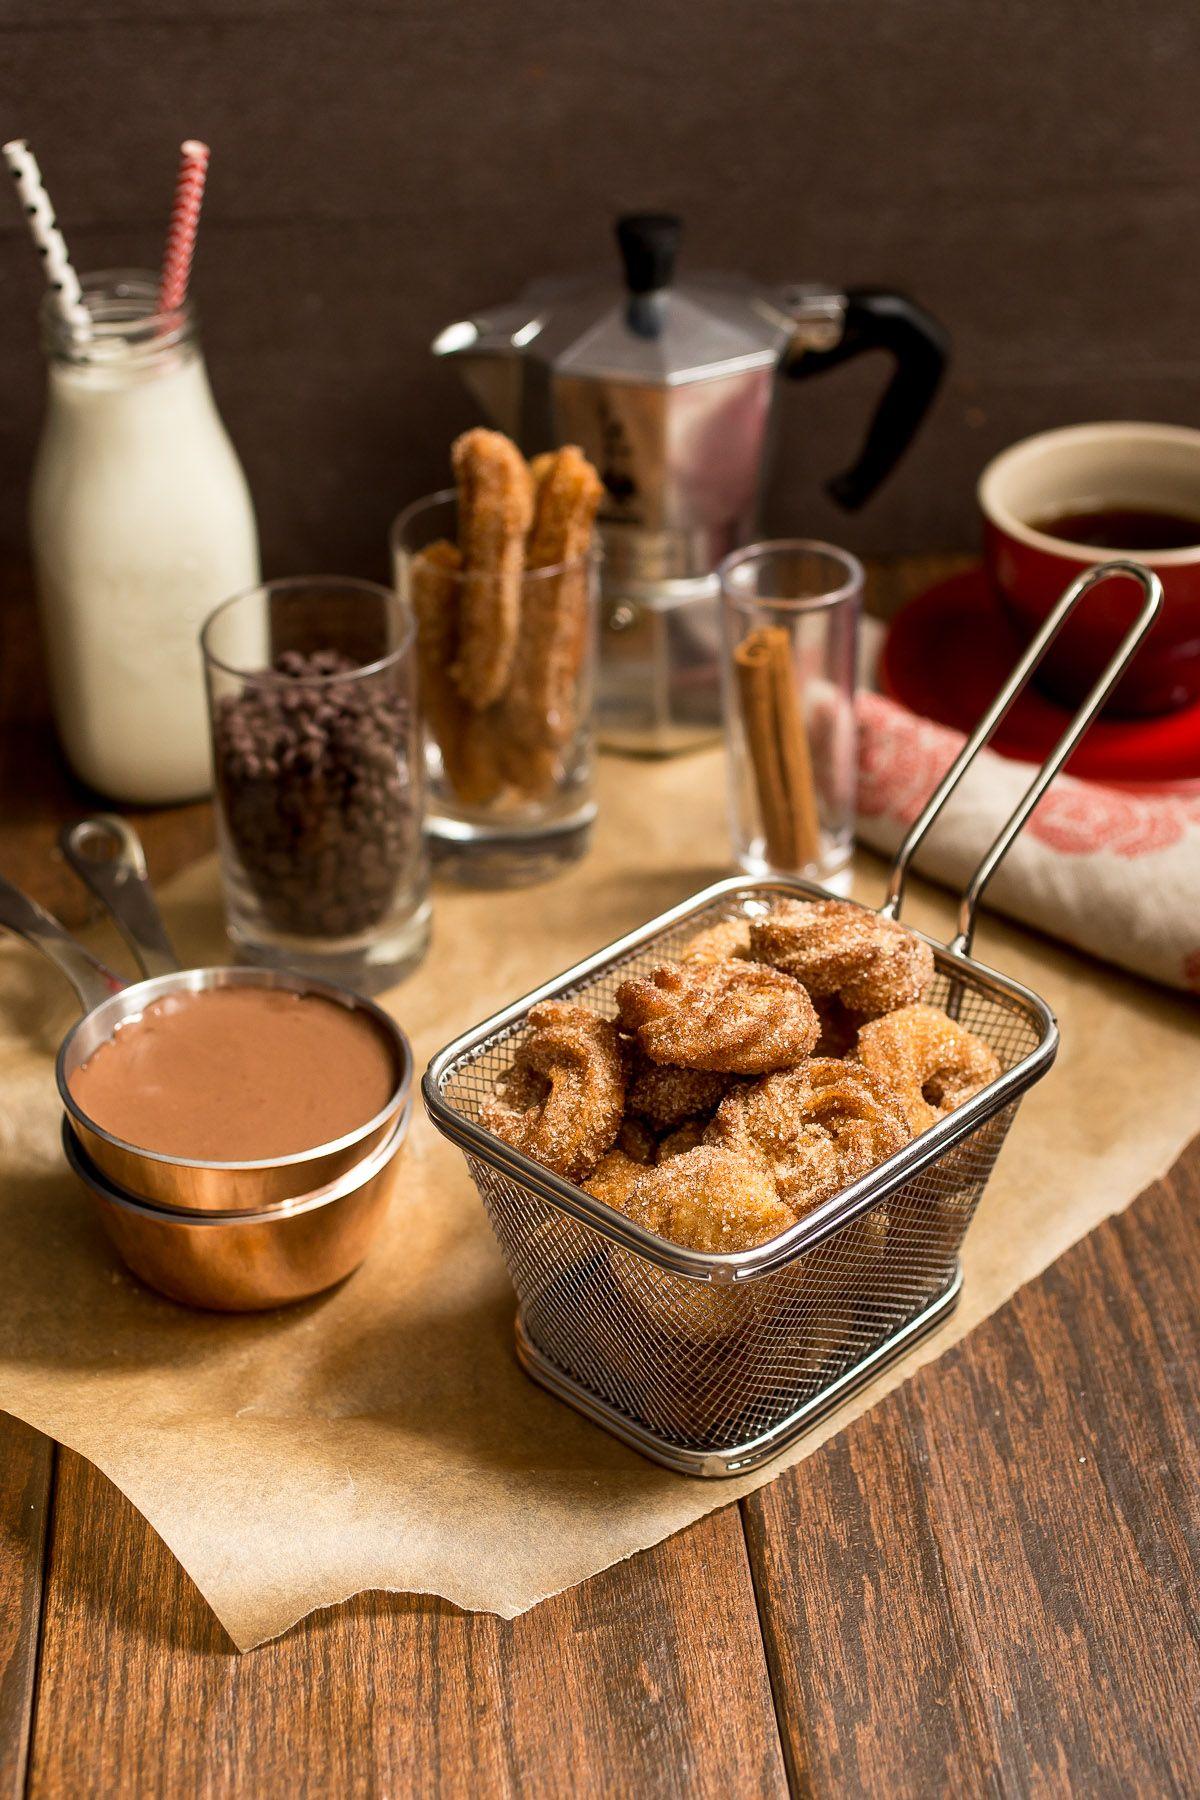 Churro Bites with Spicy Chocolate Sauce